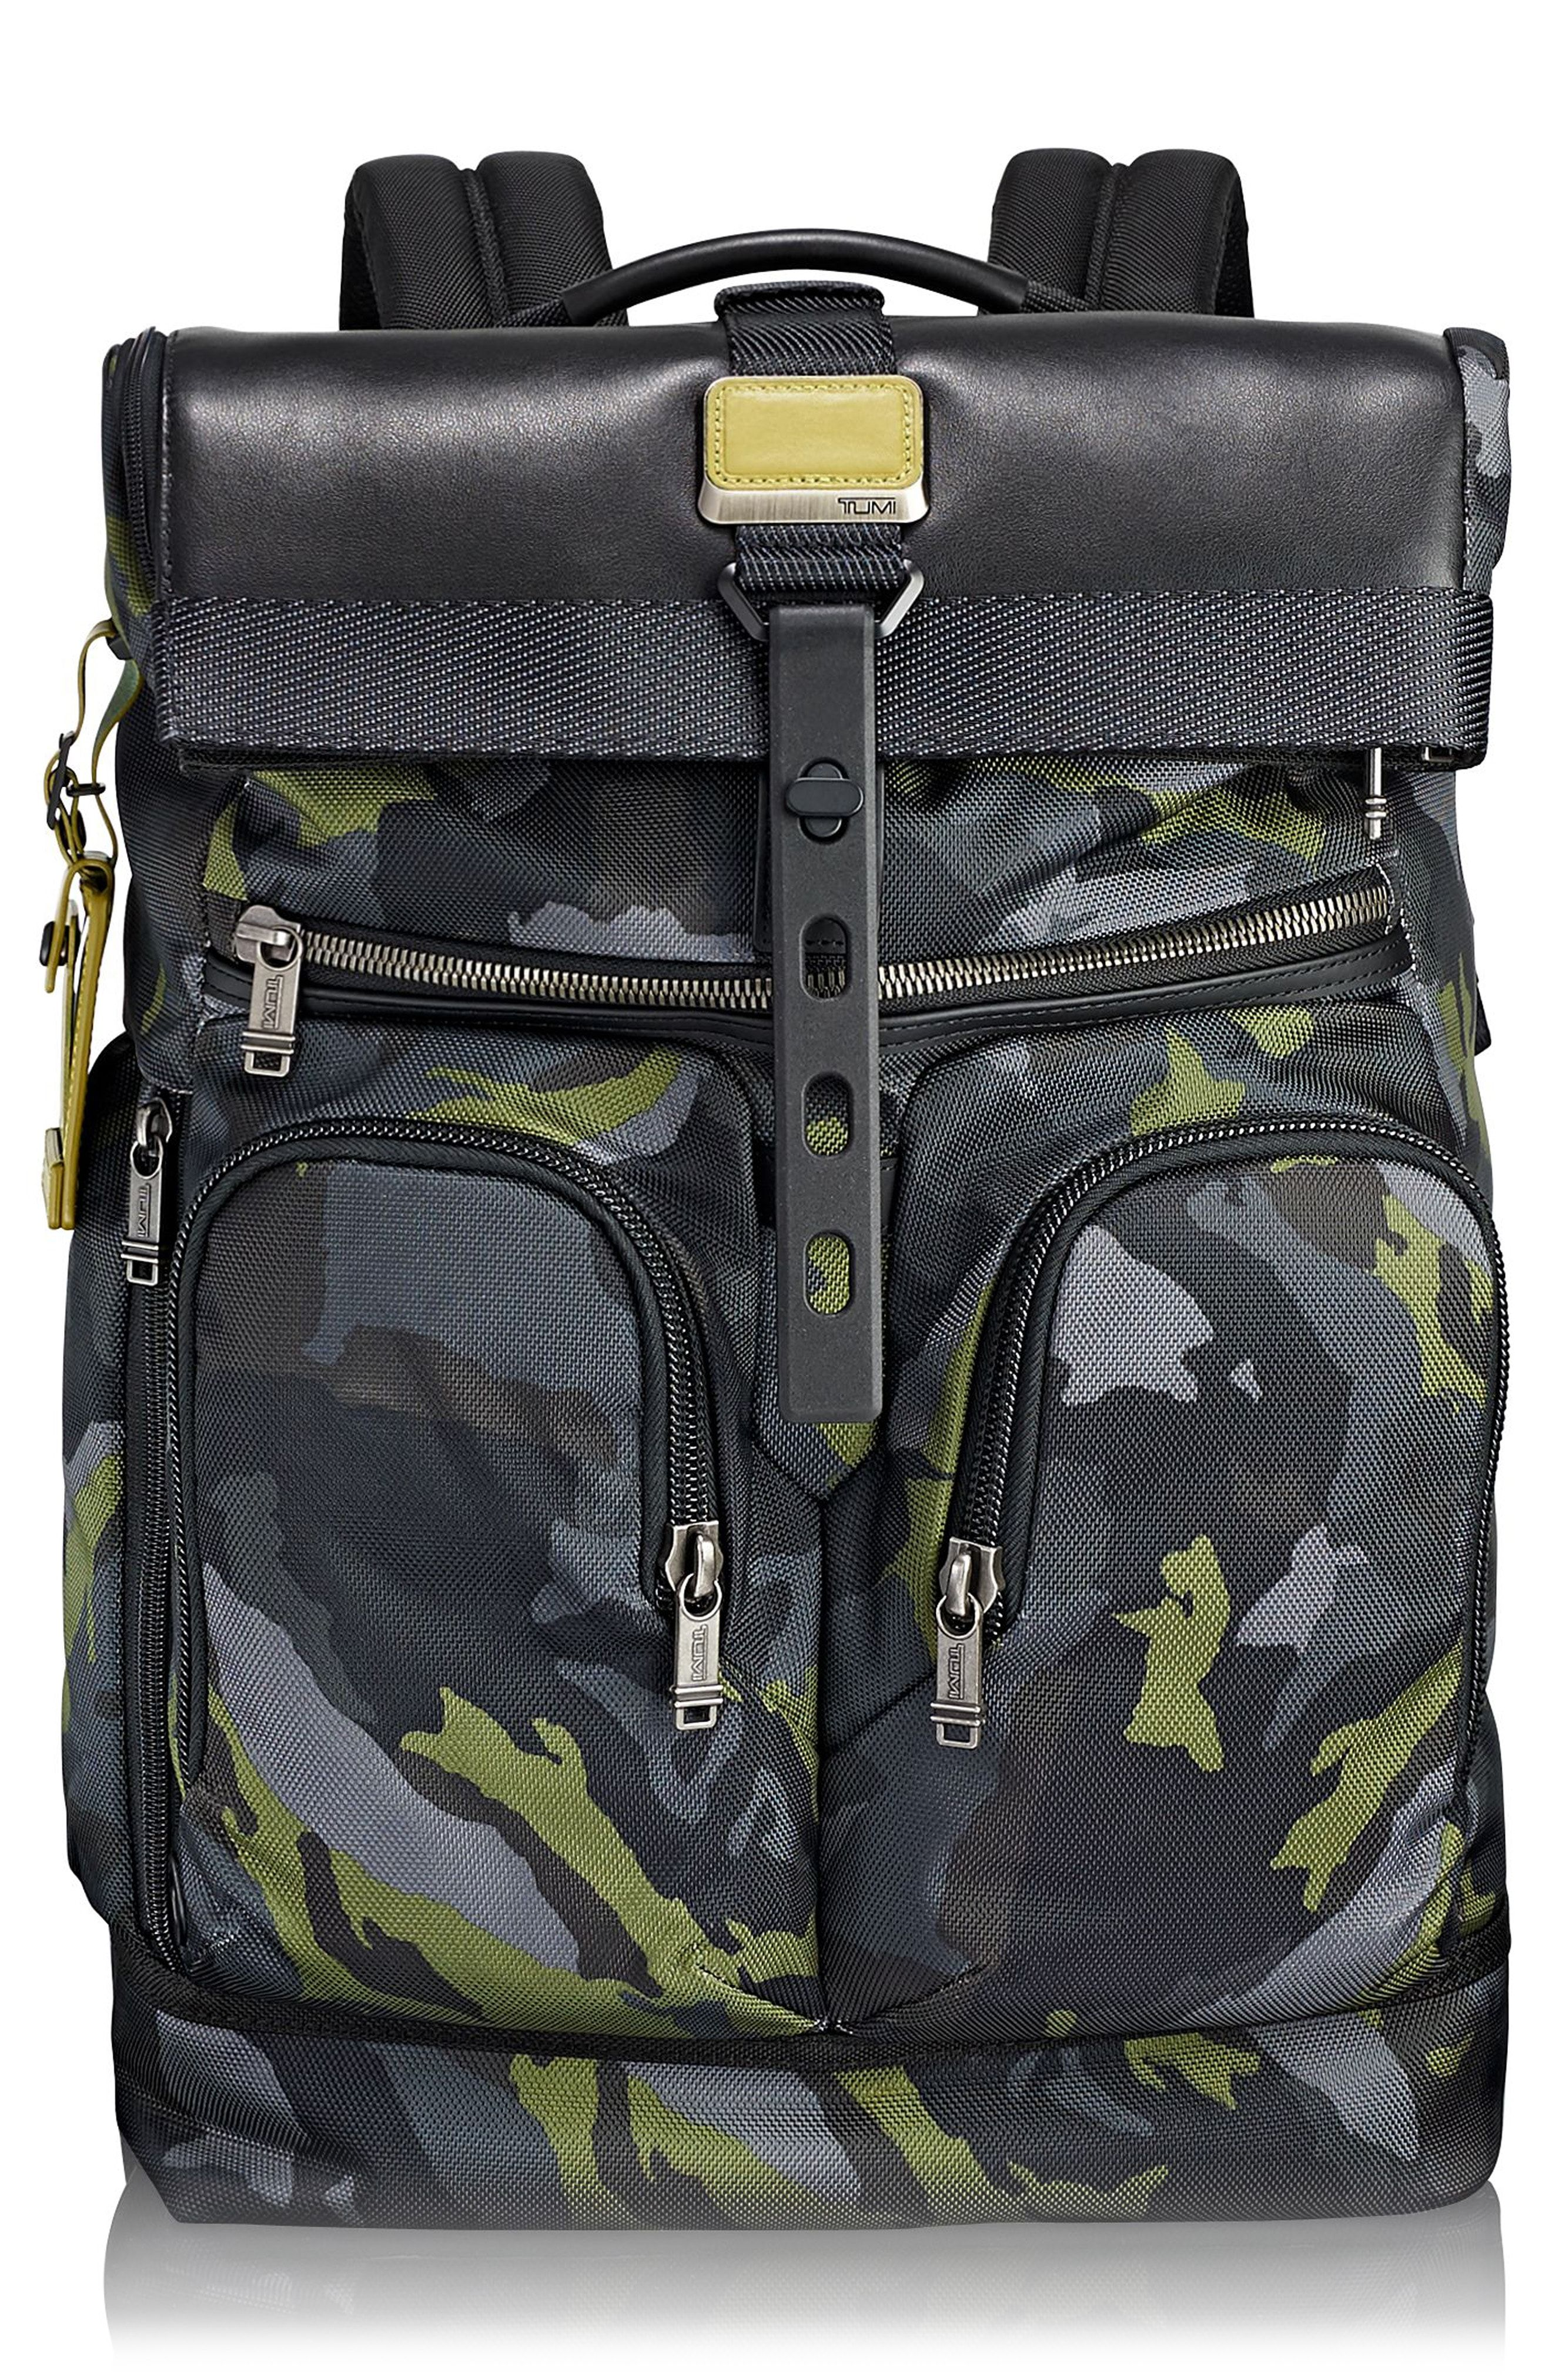 TUMI ALPHA BRAVO - LONDON BACKPACK - GREEN.  tumi  bags  leather  nylon   backpacks 779b8c9687